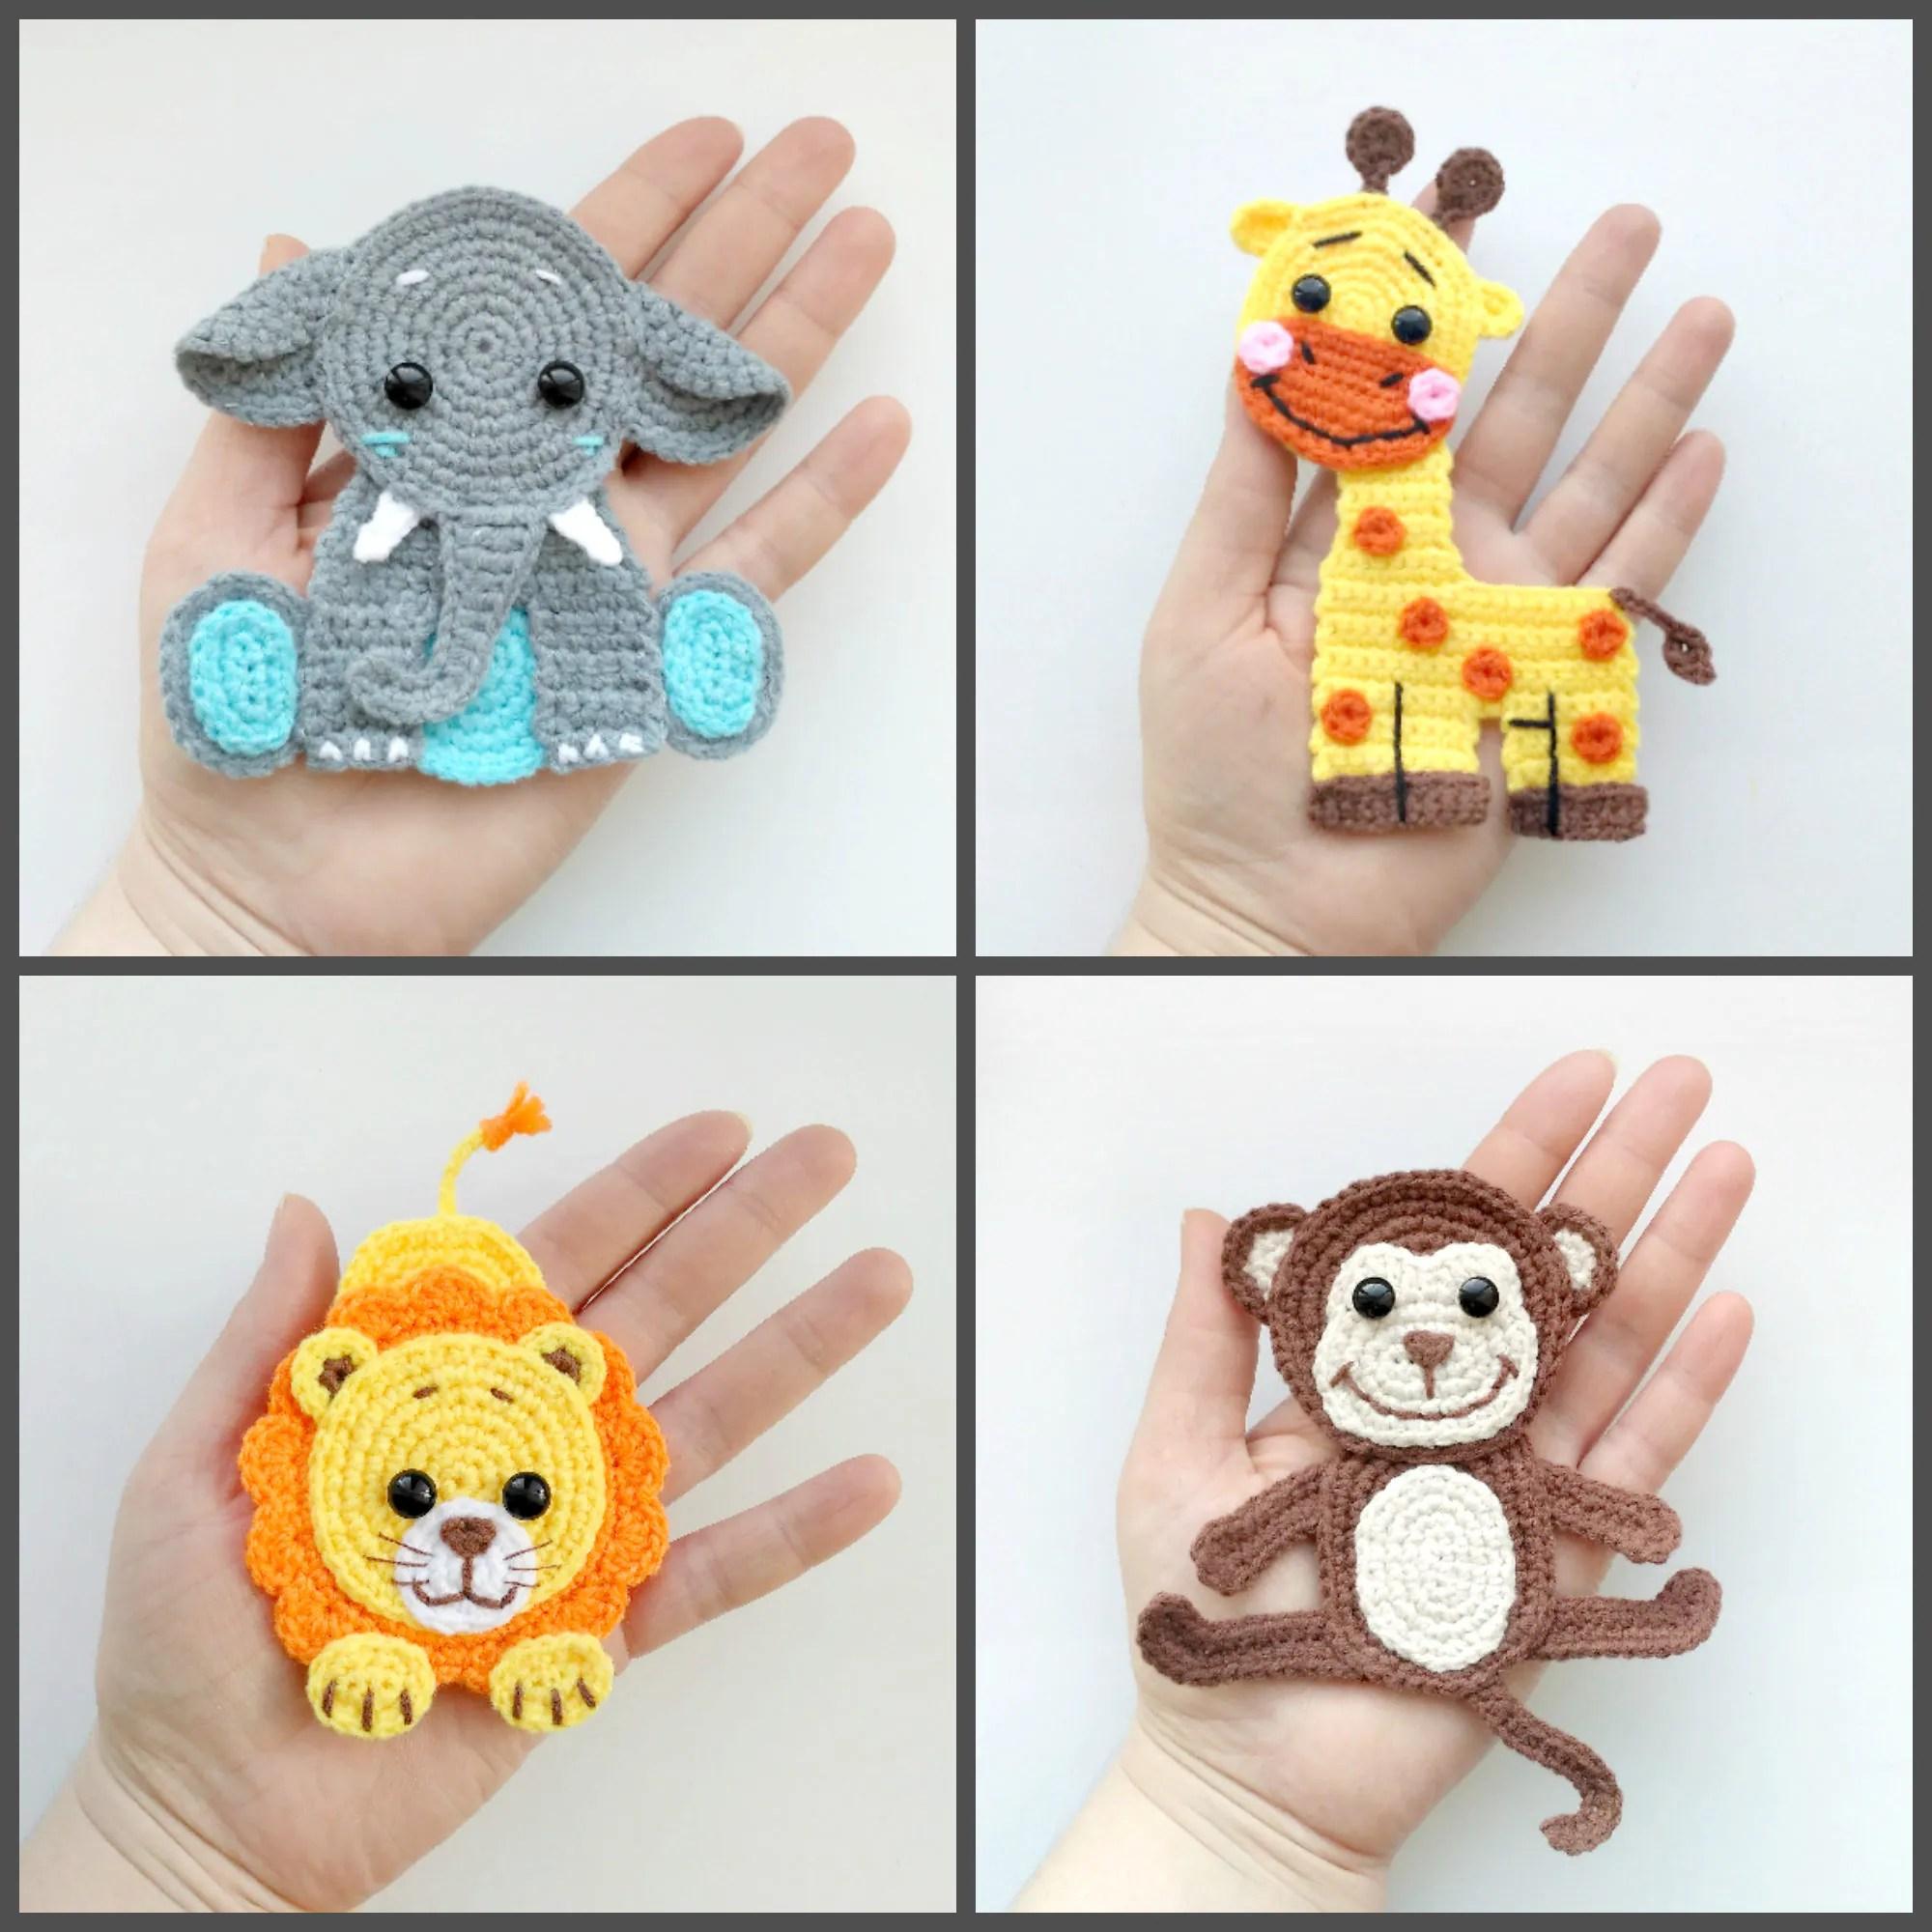 Pattern Jungle Animal Applique Crochet Patterns